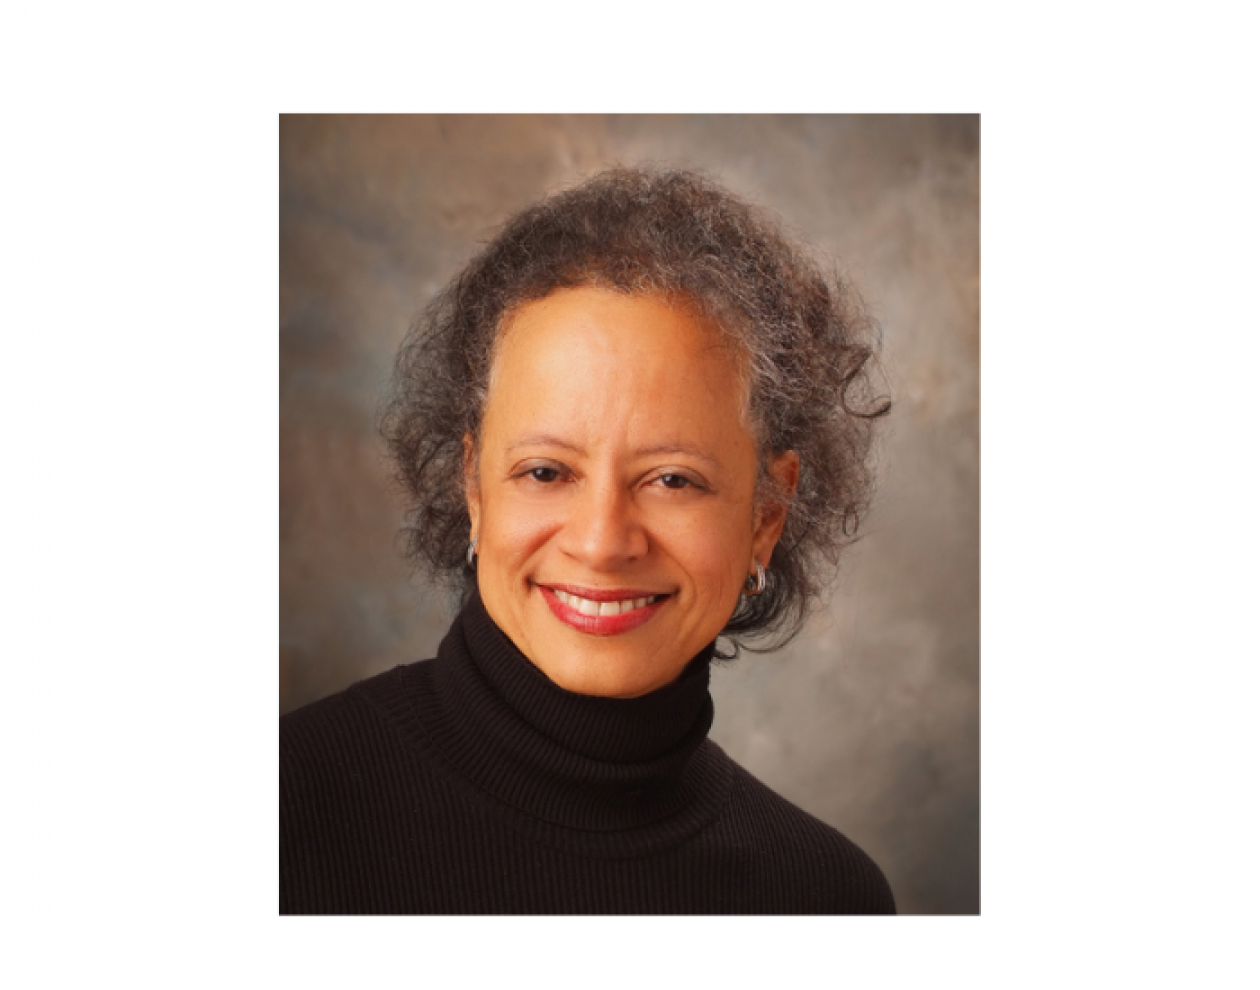 Dr. Lori Pierce wearing a black neck-collar sweater. She is smiling facing forward.